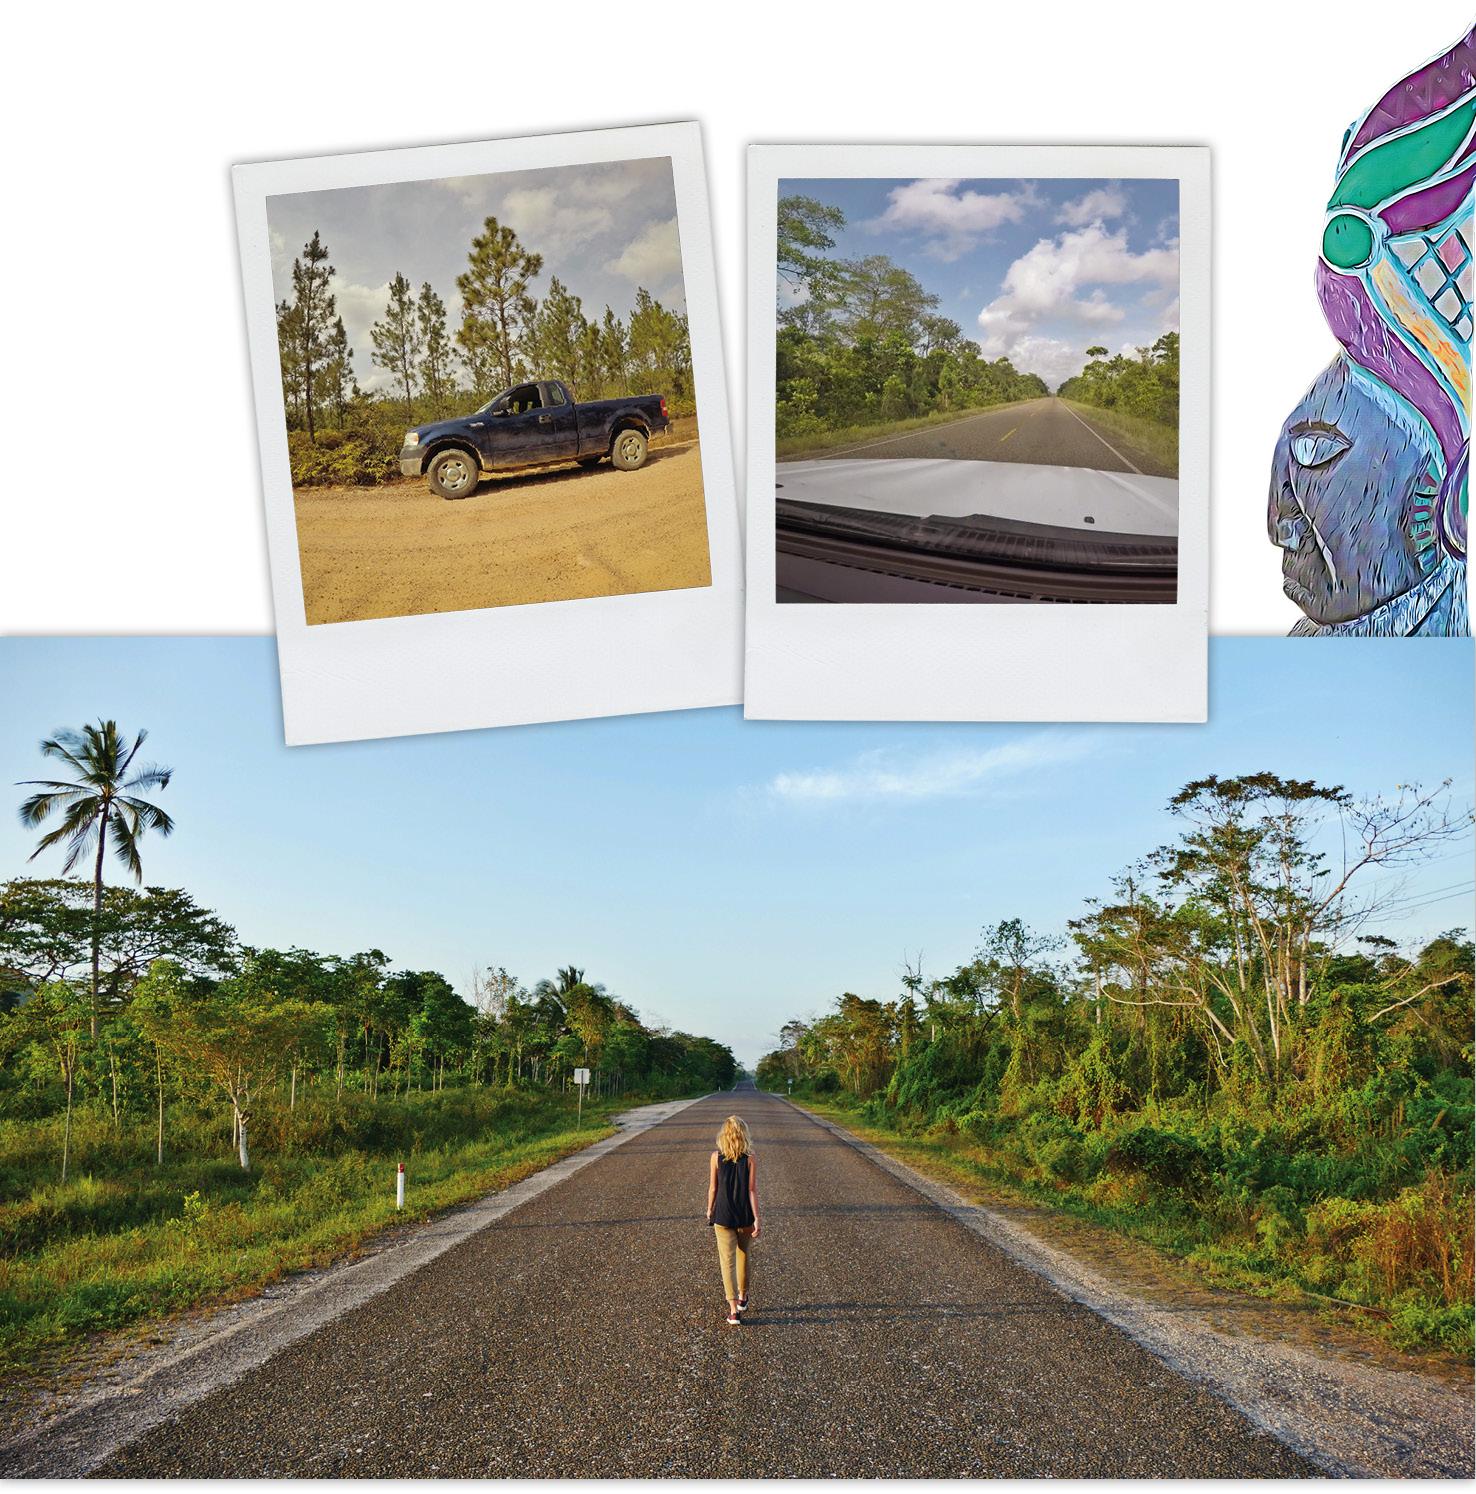 belize, voyage, road trip, temple, mayas, jungle, montagne, caracol, lubaantun